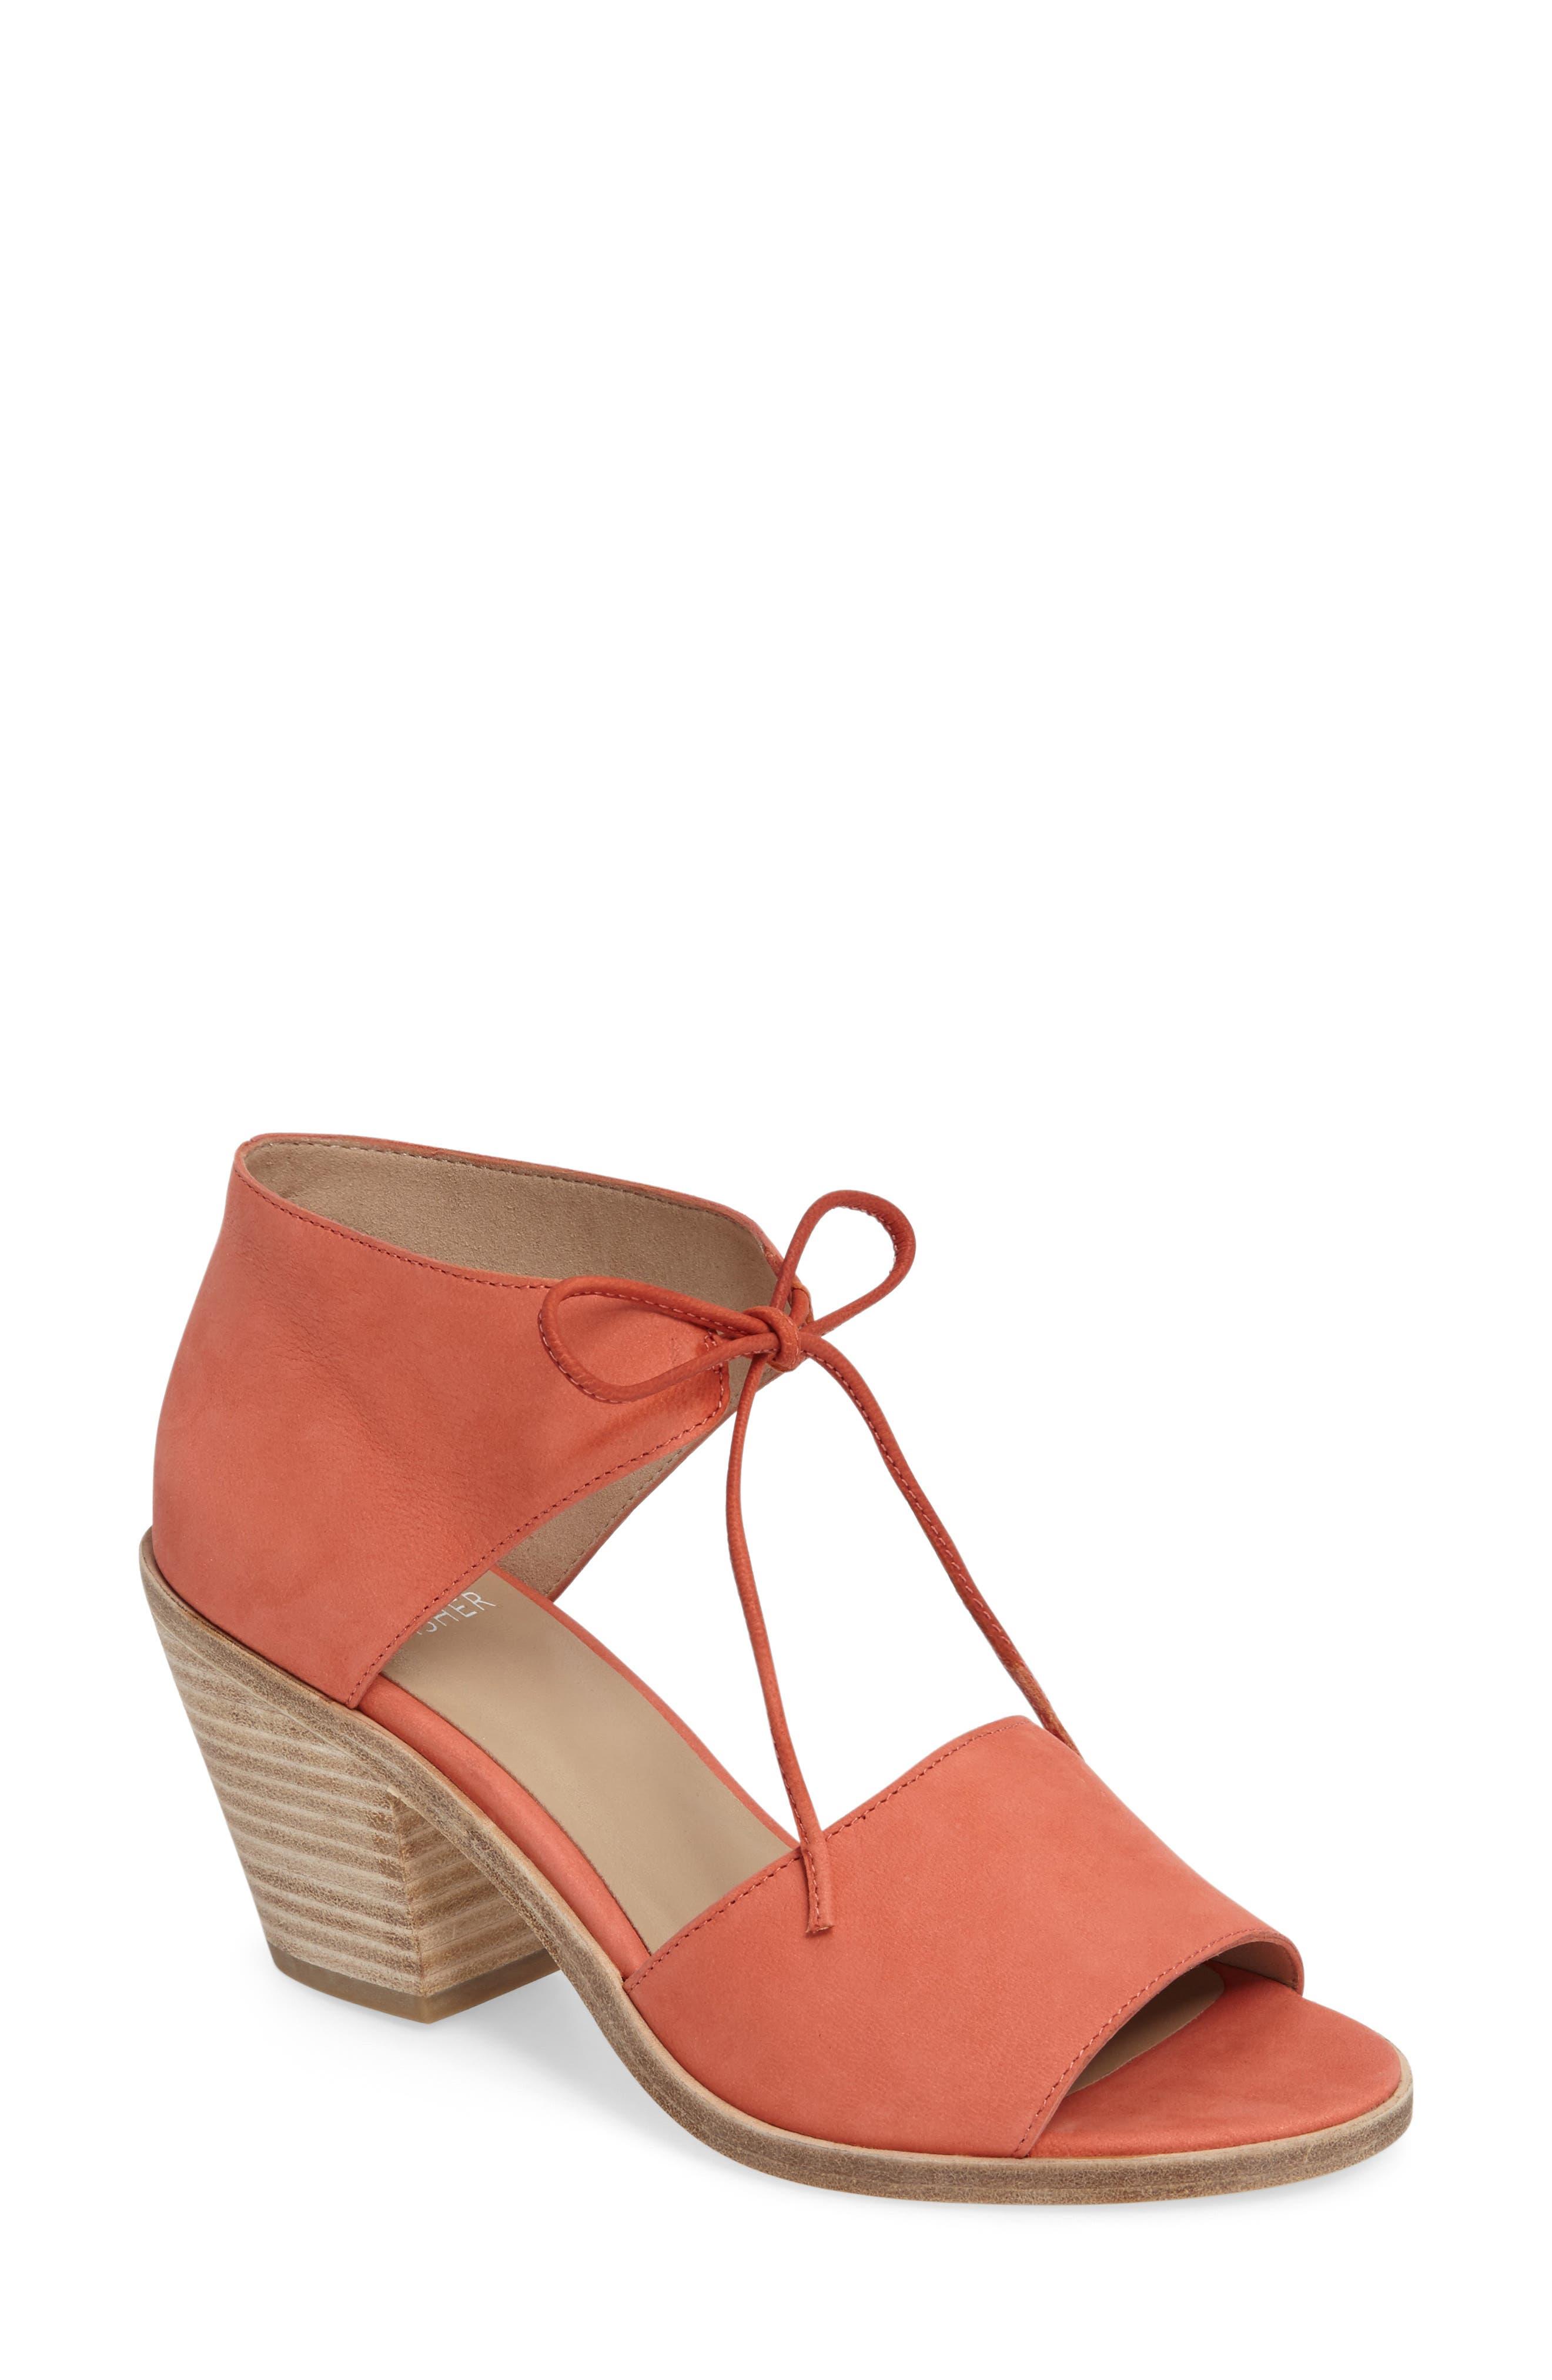 Alternate Image 1 Selected - Eileen Fisher Ann Ankle Tie Sandal (Women)